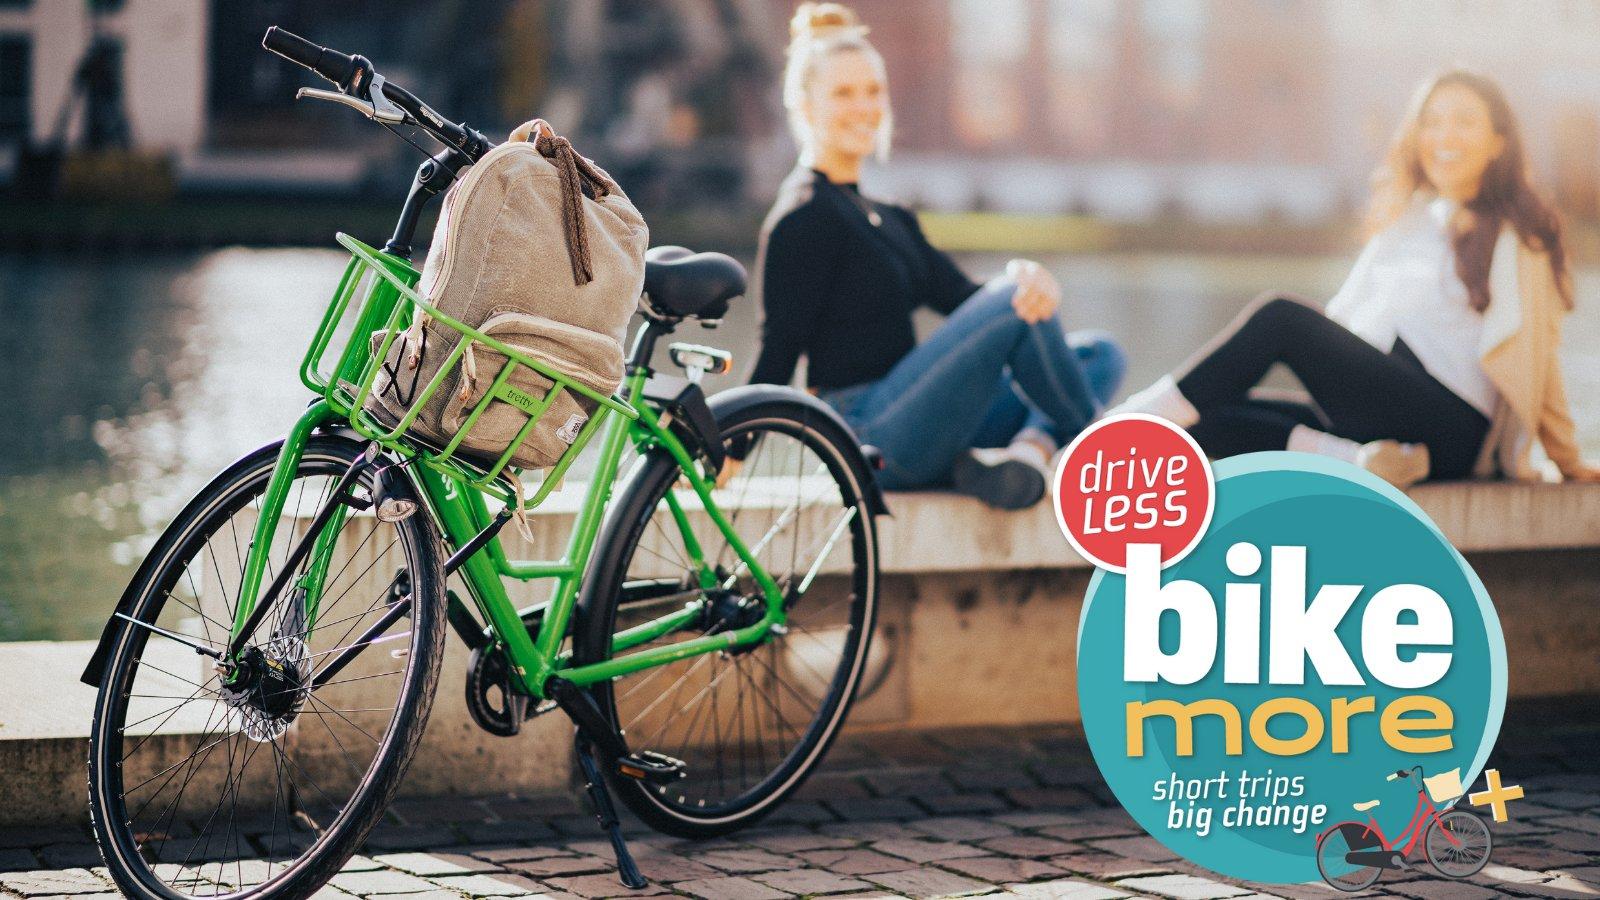 Bike more. Drive less.